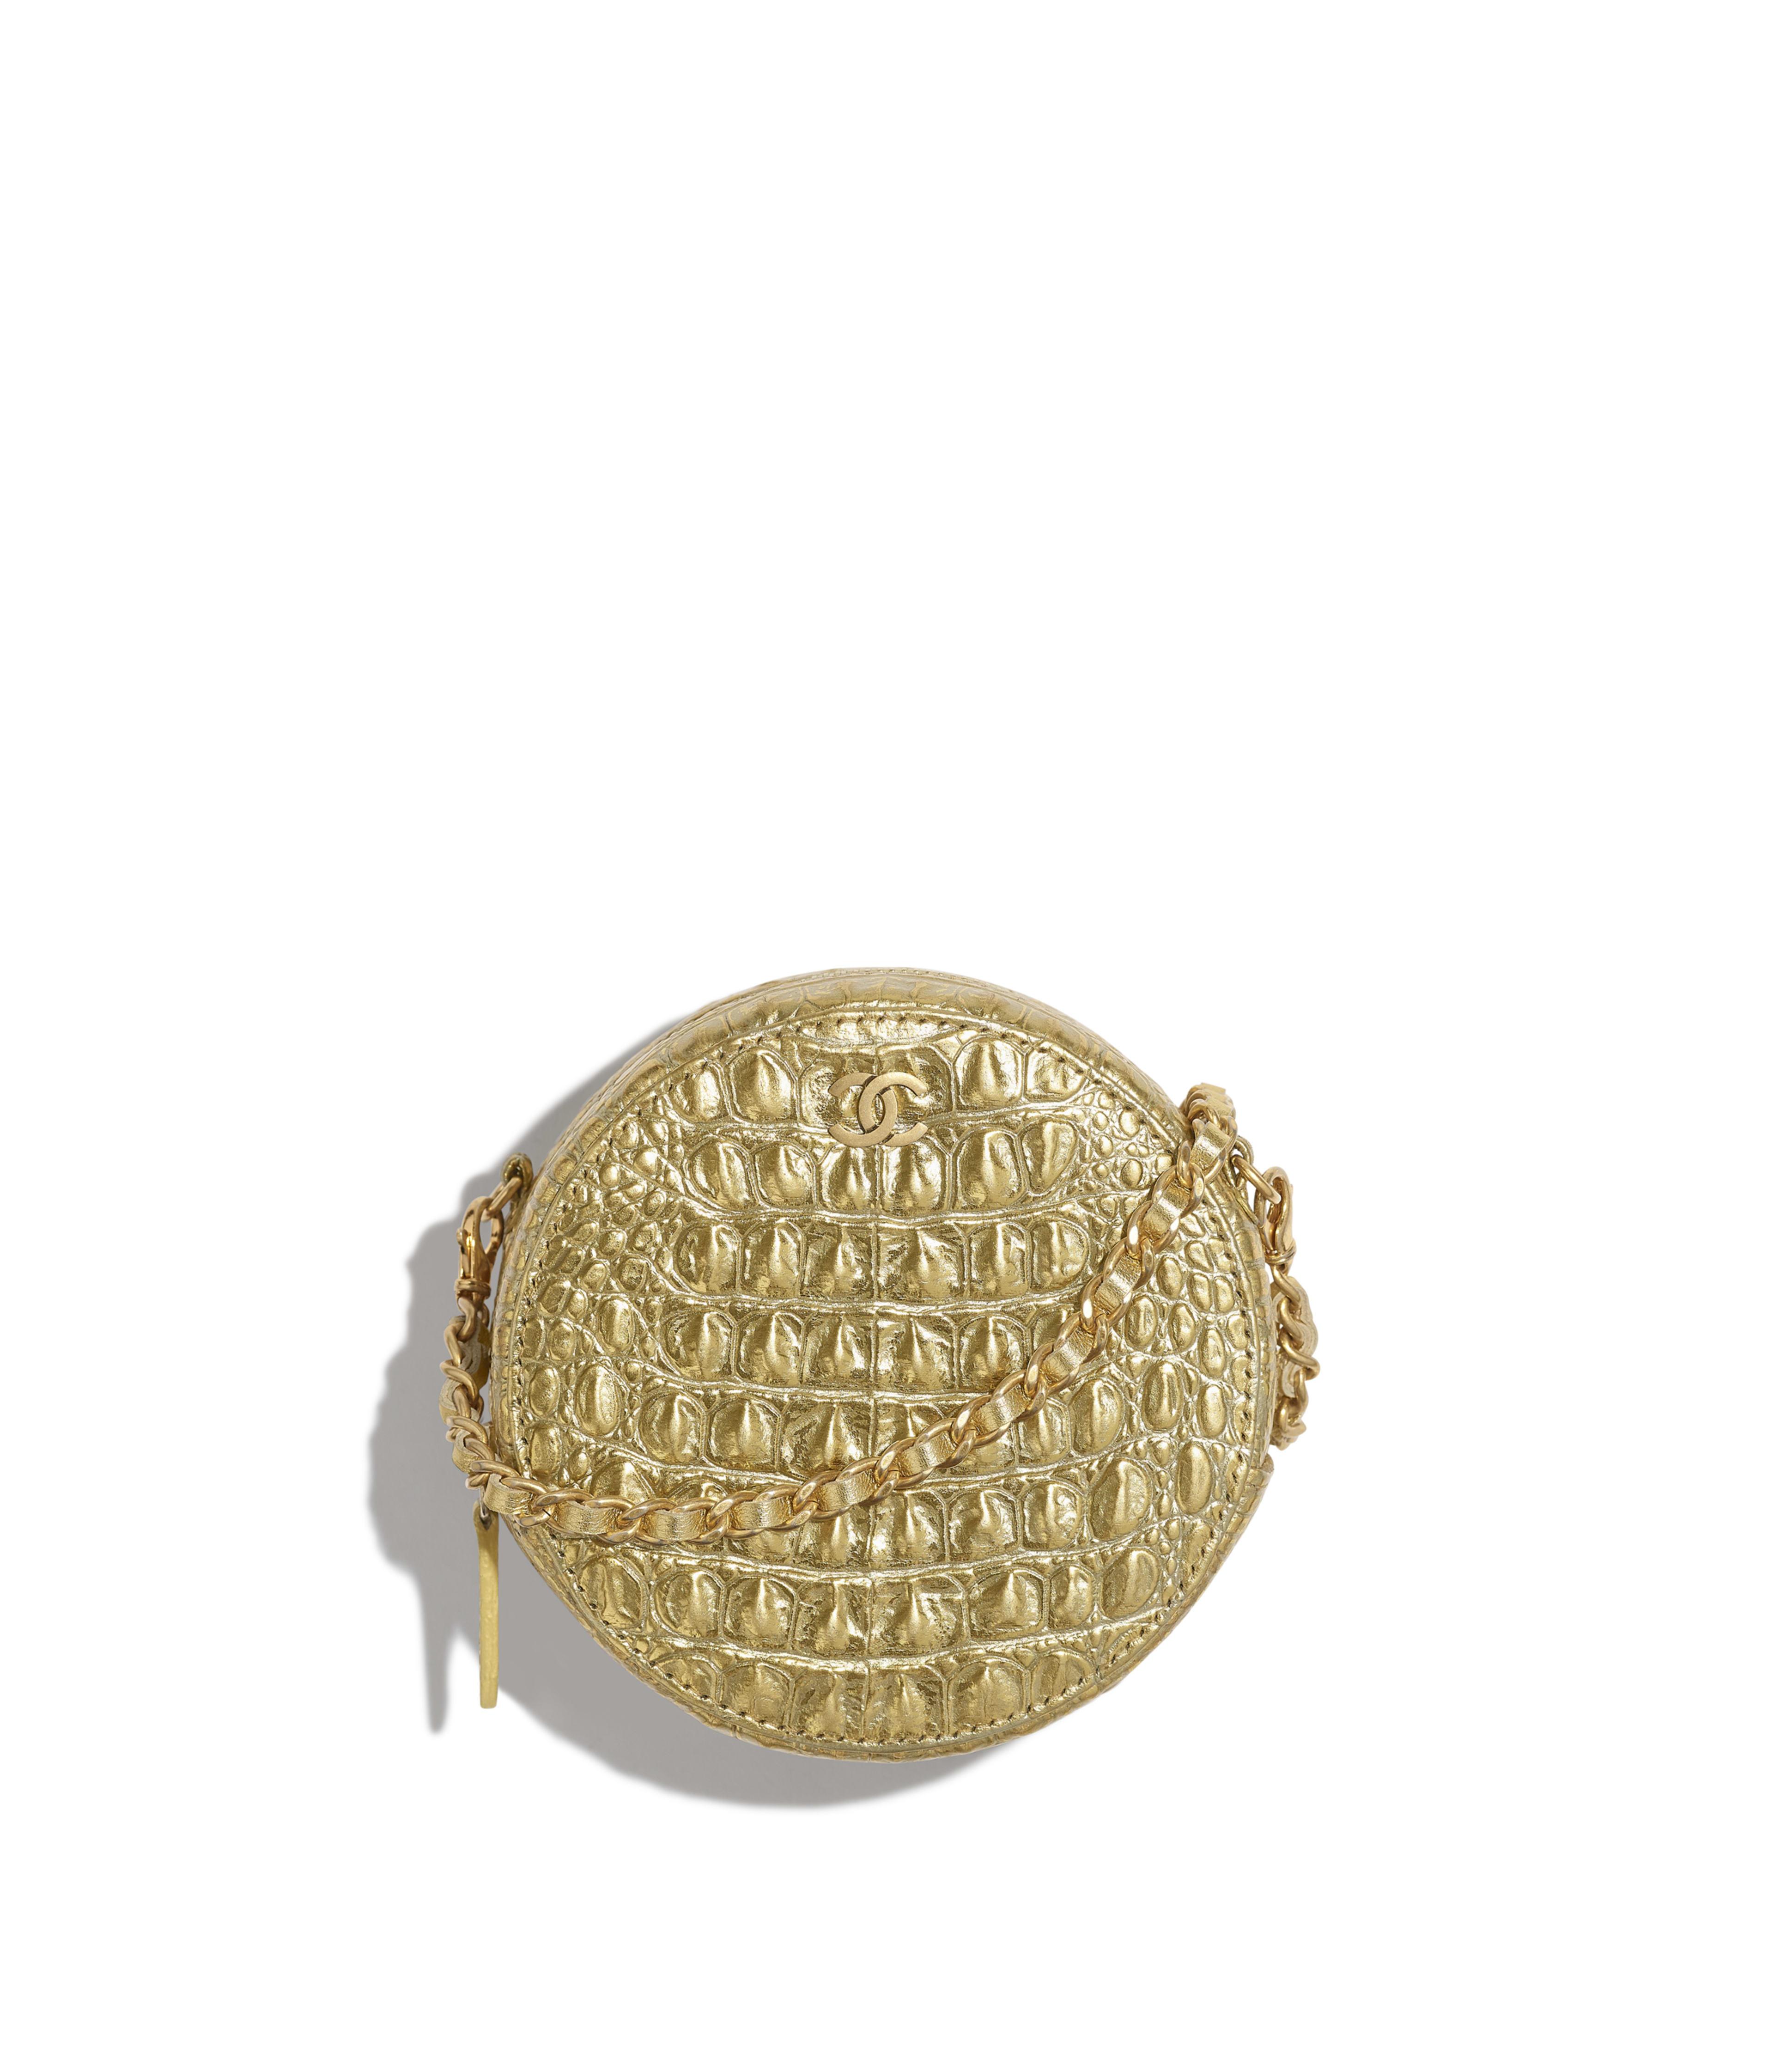 5dbd36d1dedfd4 Classic Clutch with Chain Metallic Crocodile Embossed Calfskin & Gold  Metal, Gold Ref. AP0366B00798N4752